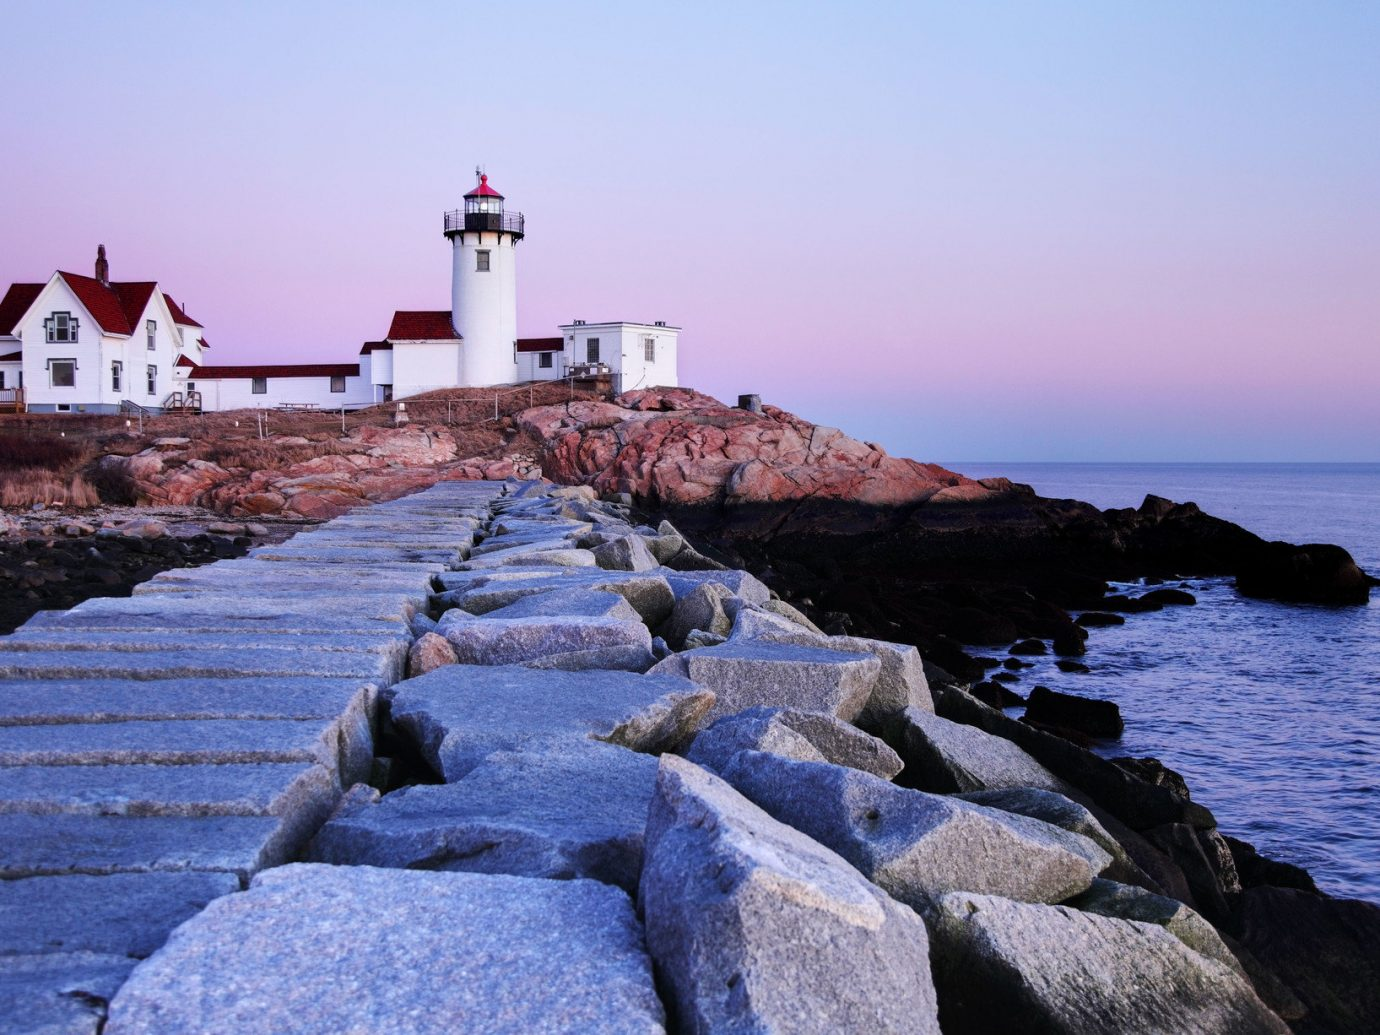 Trip Ideas outdoor sky rock water lighthouse Sea tower Coast rocky shore Ocean house Nature cape Beach cove stone